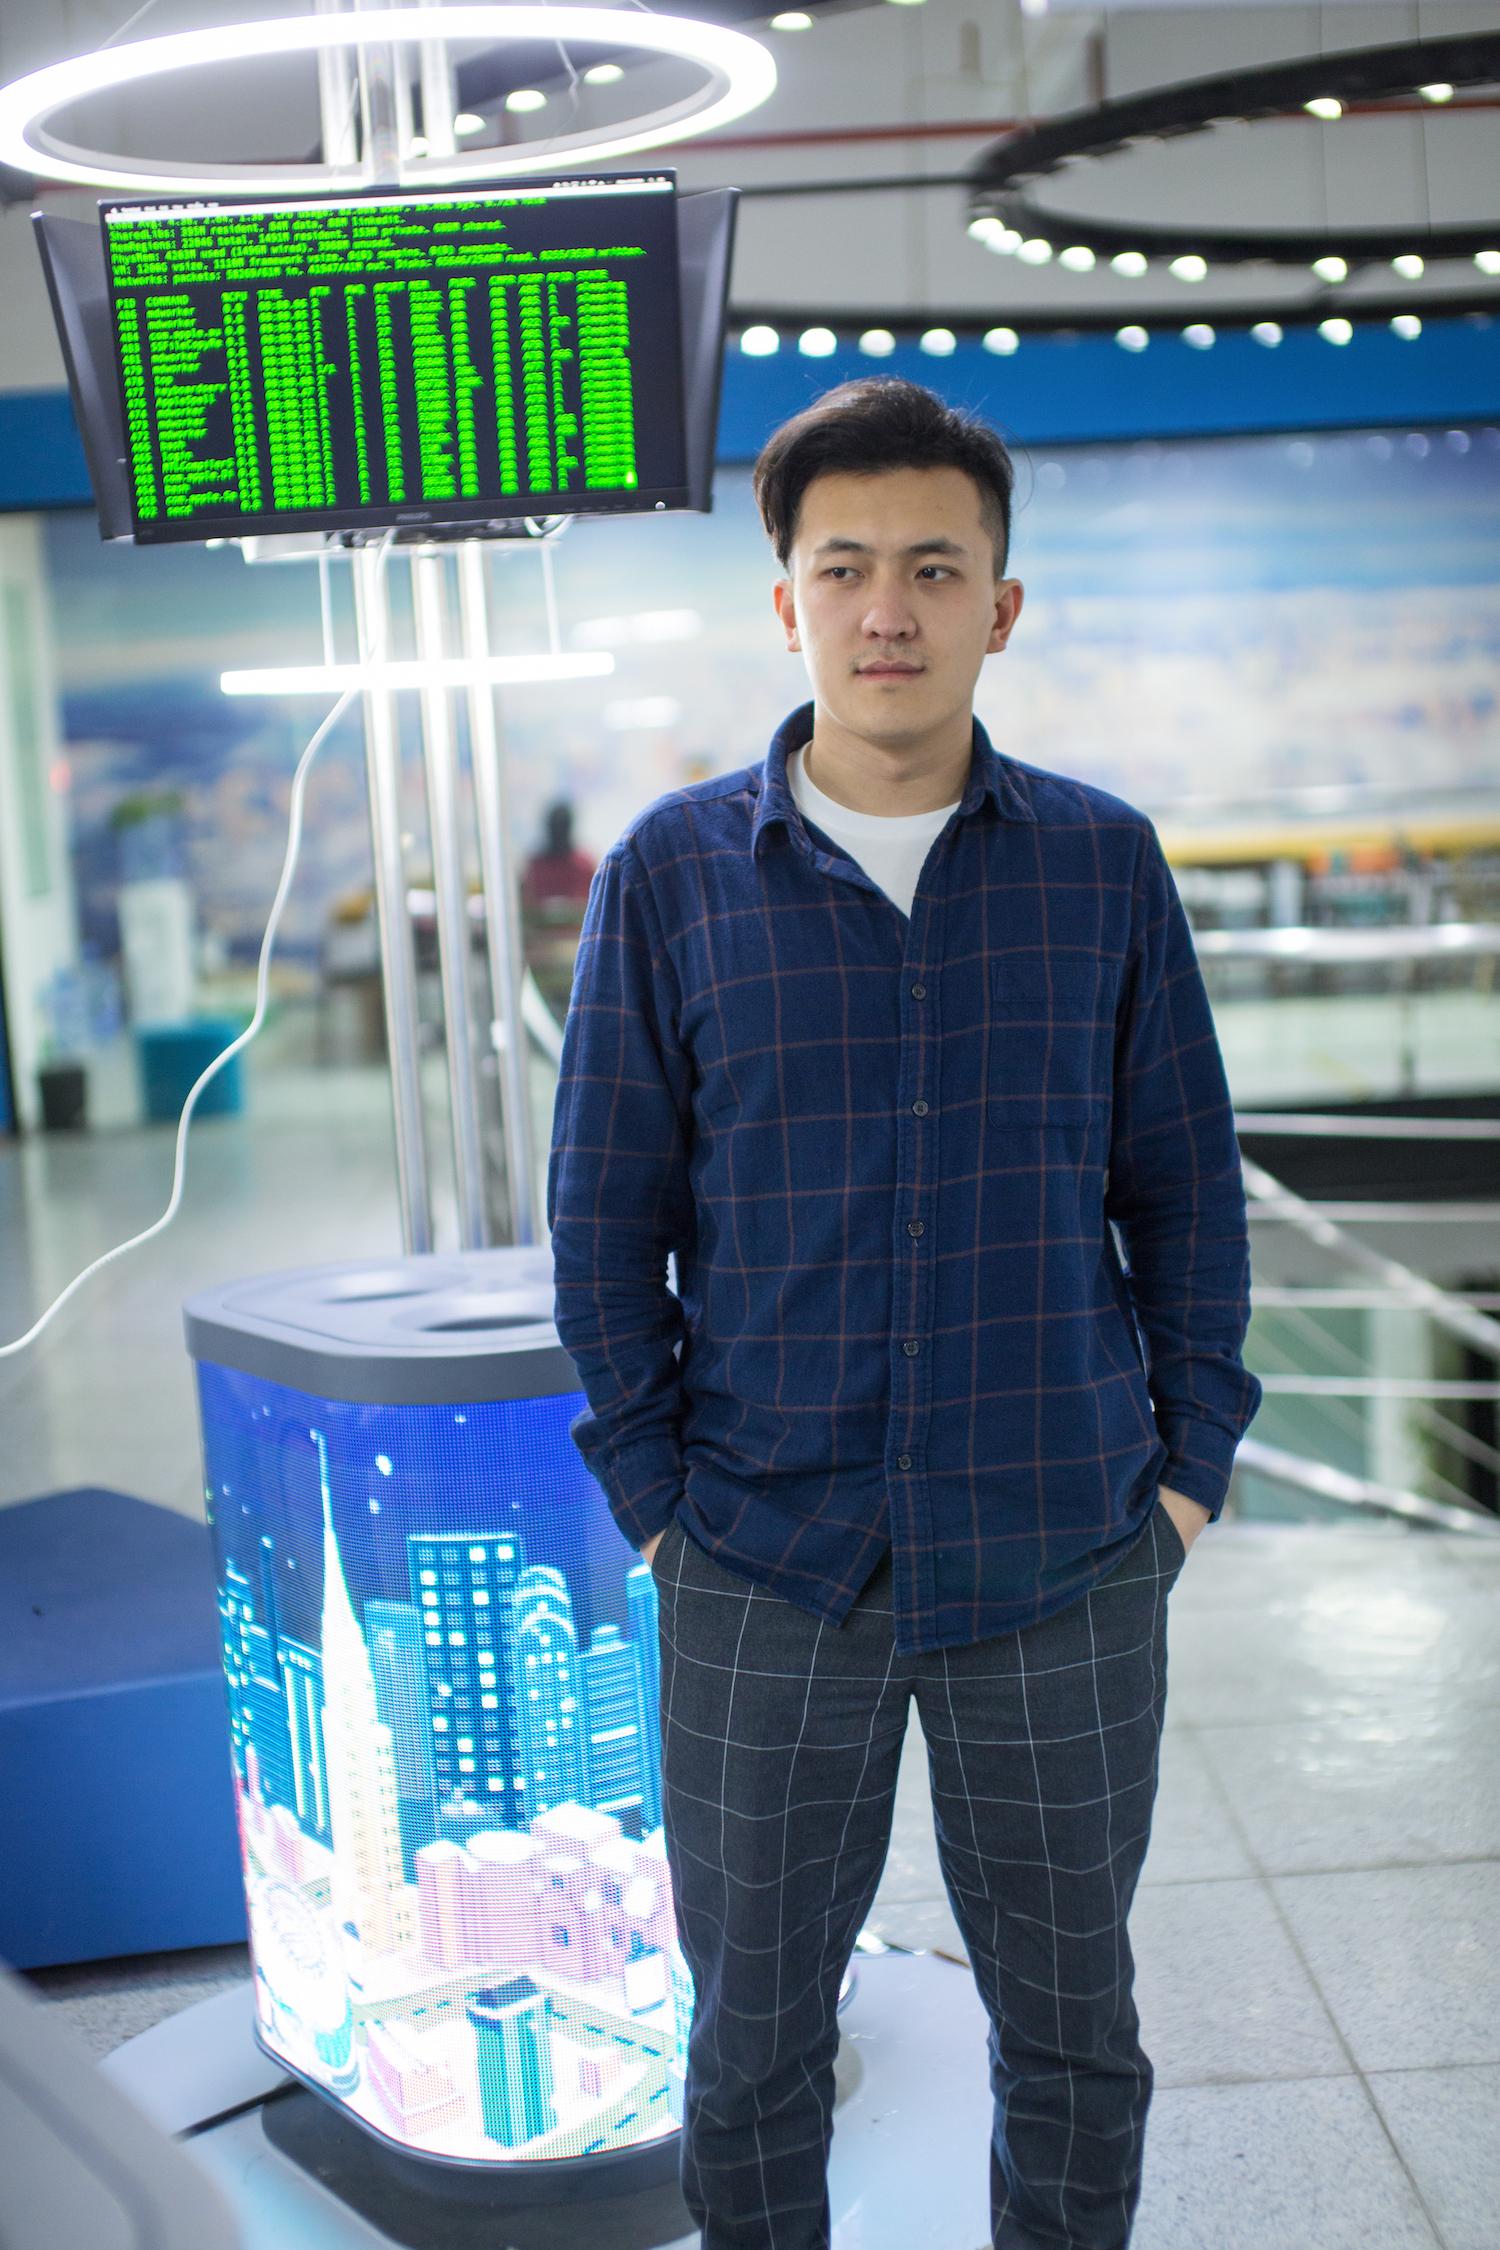 Steven Bai, the CEO of Sencity. Photo courtesy of Sencity.